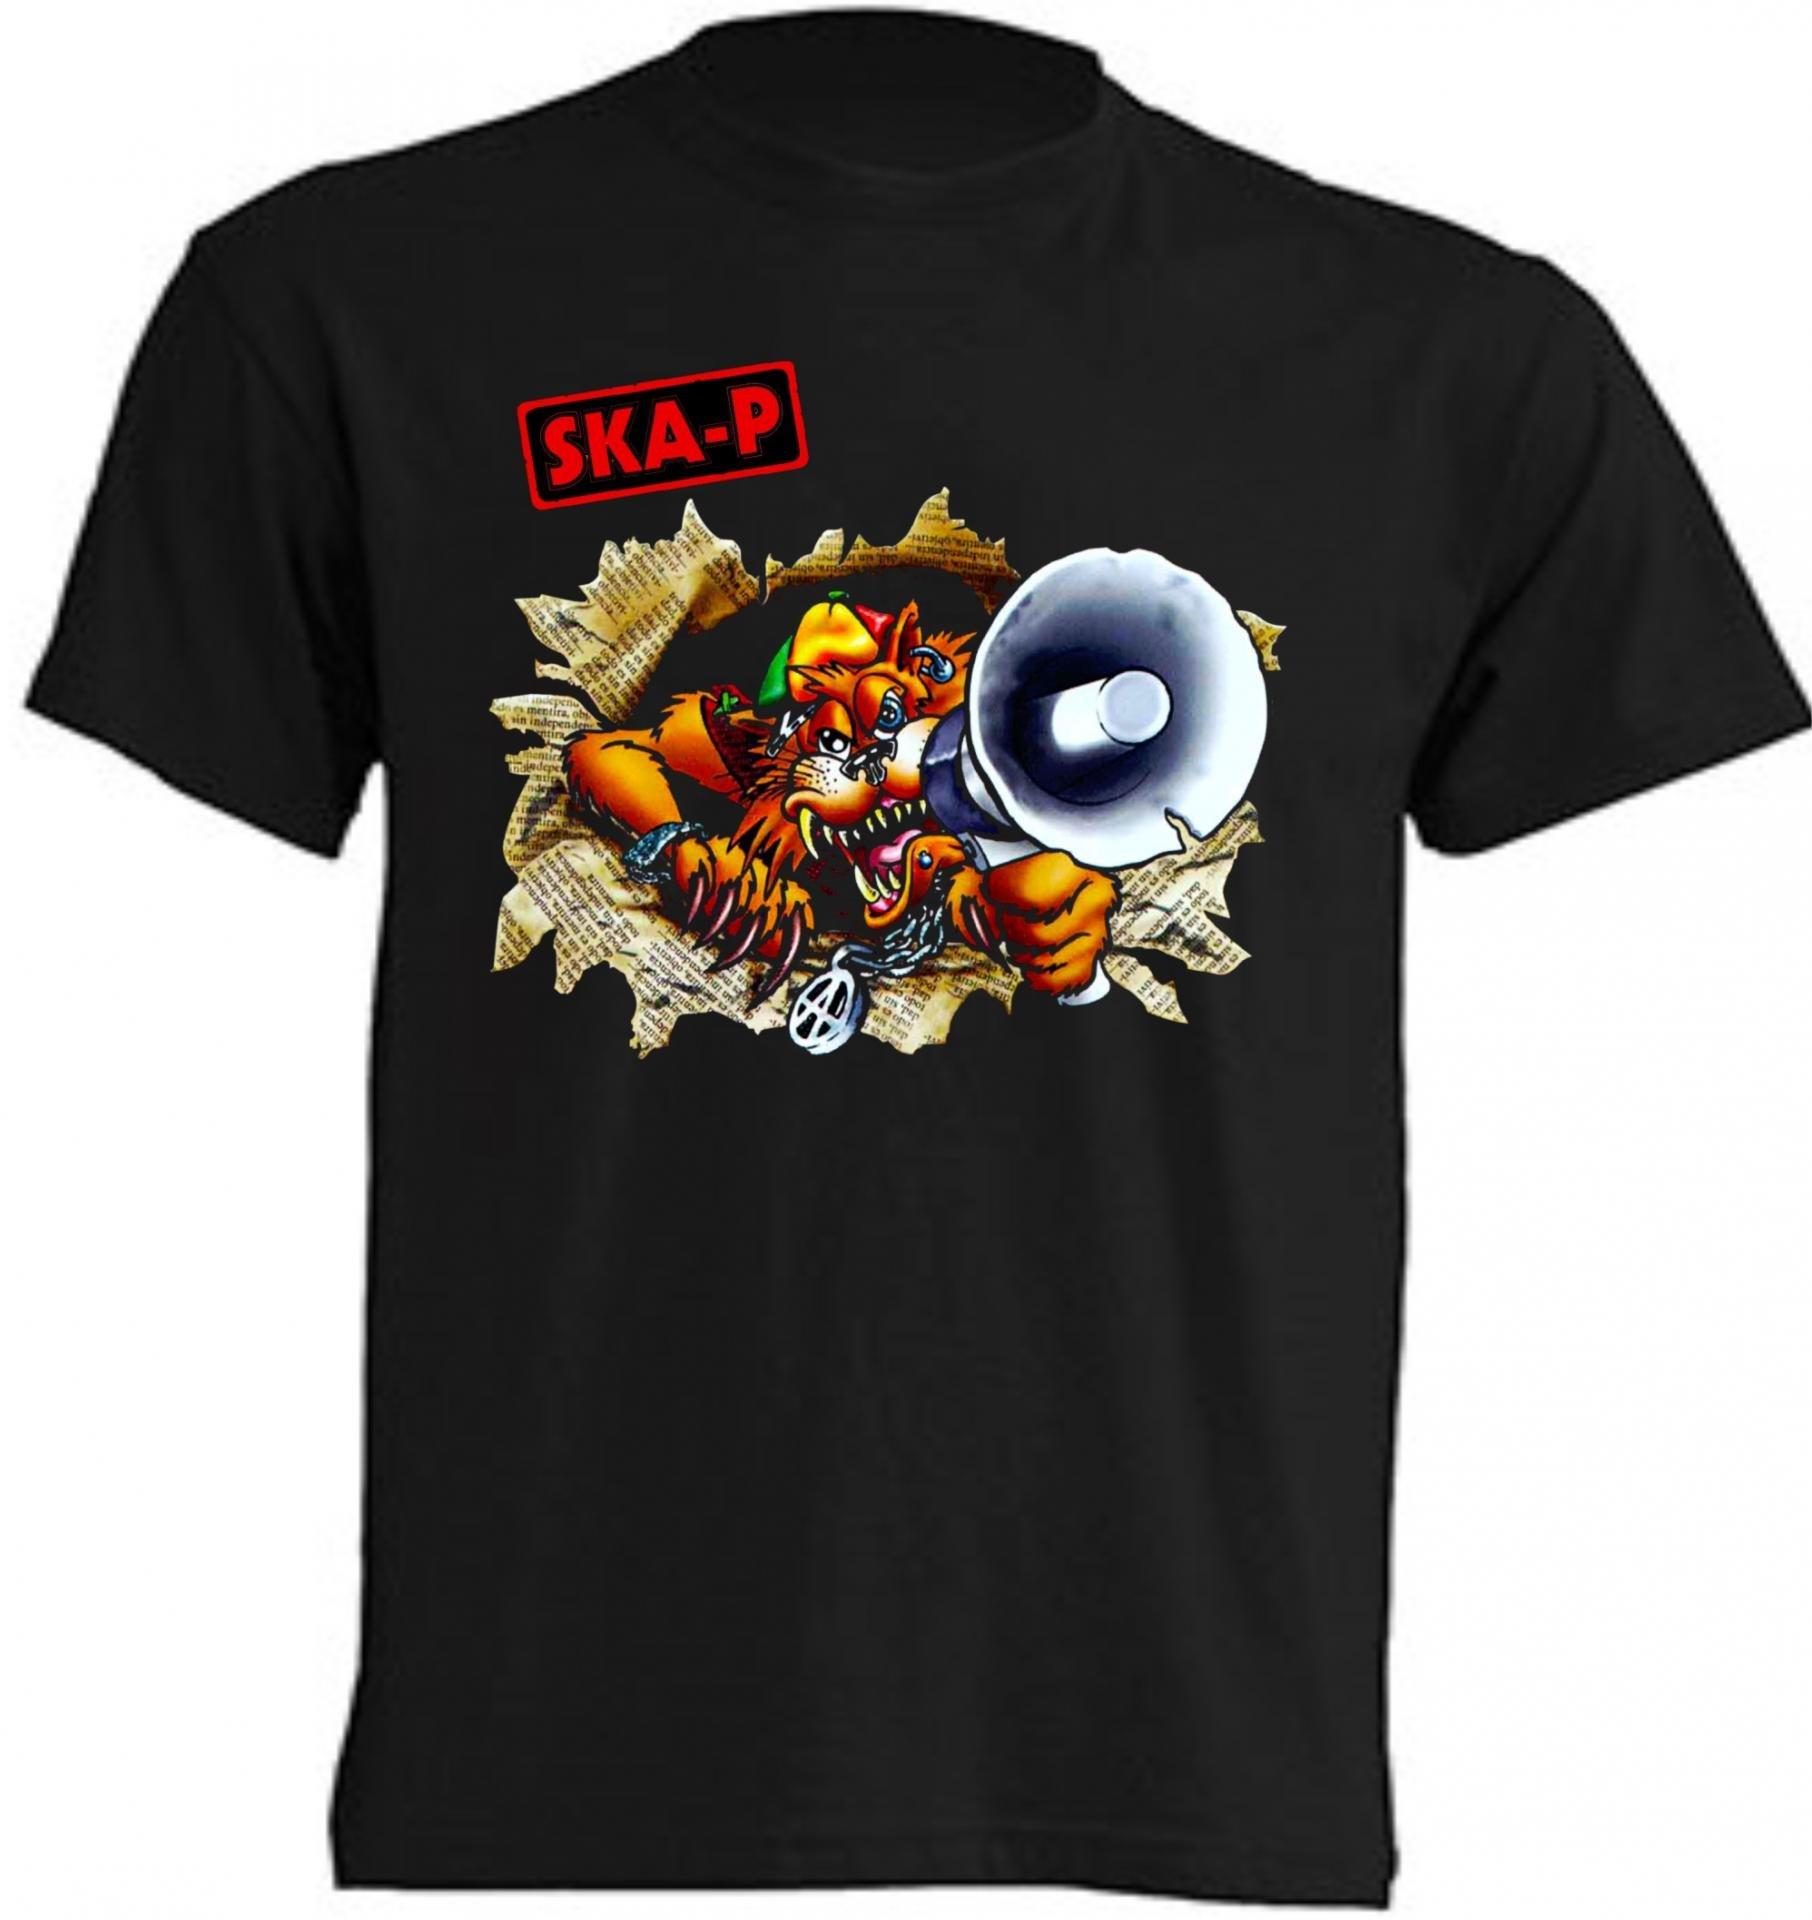 grupo ska-p camiseta española rock